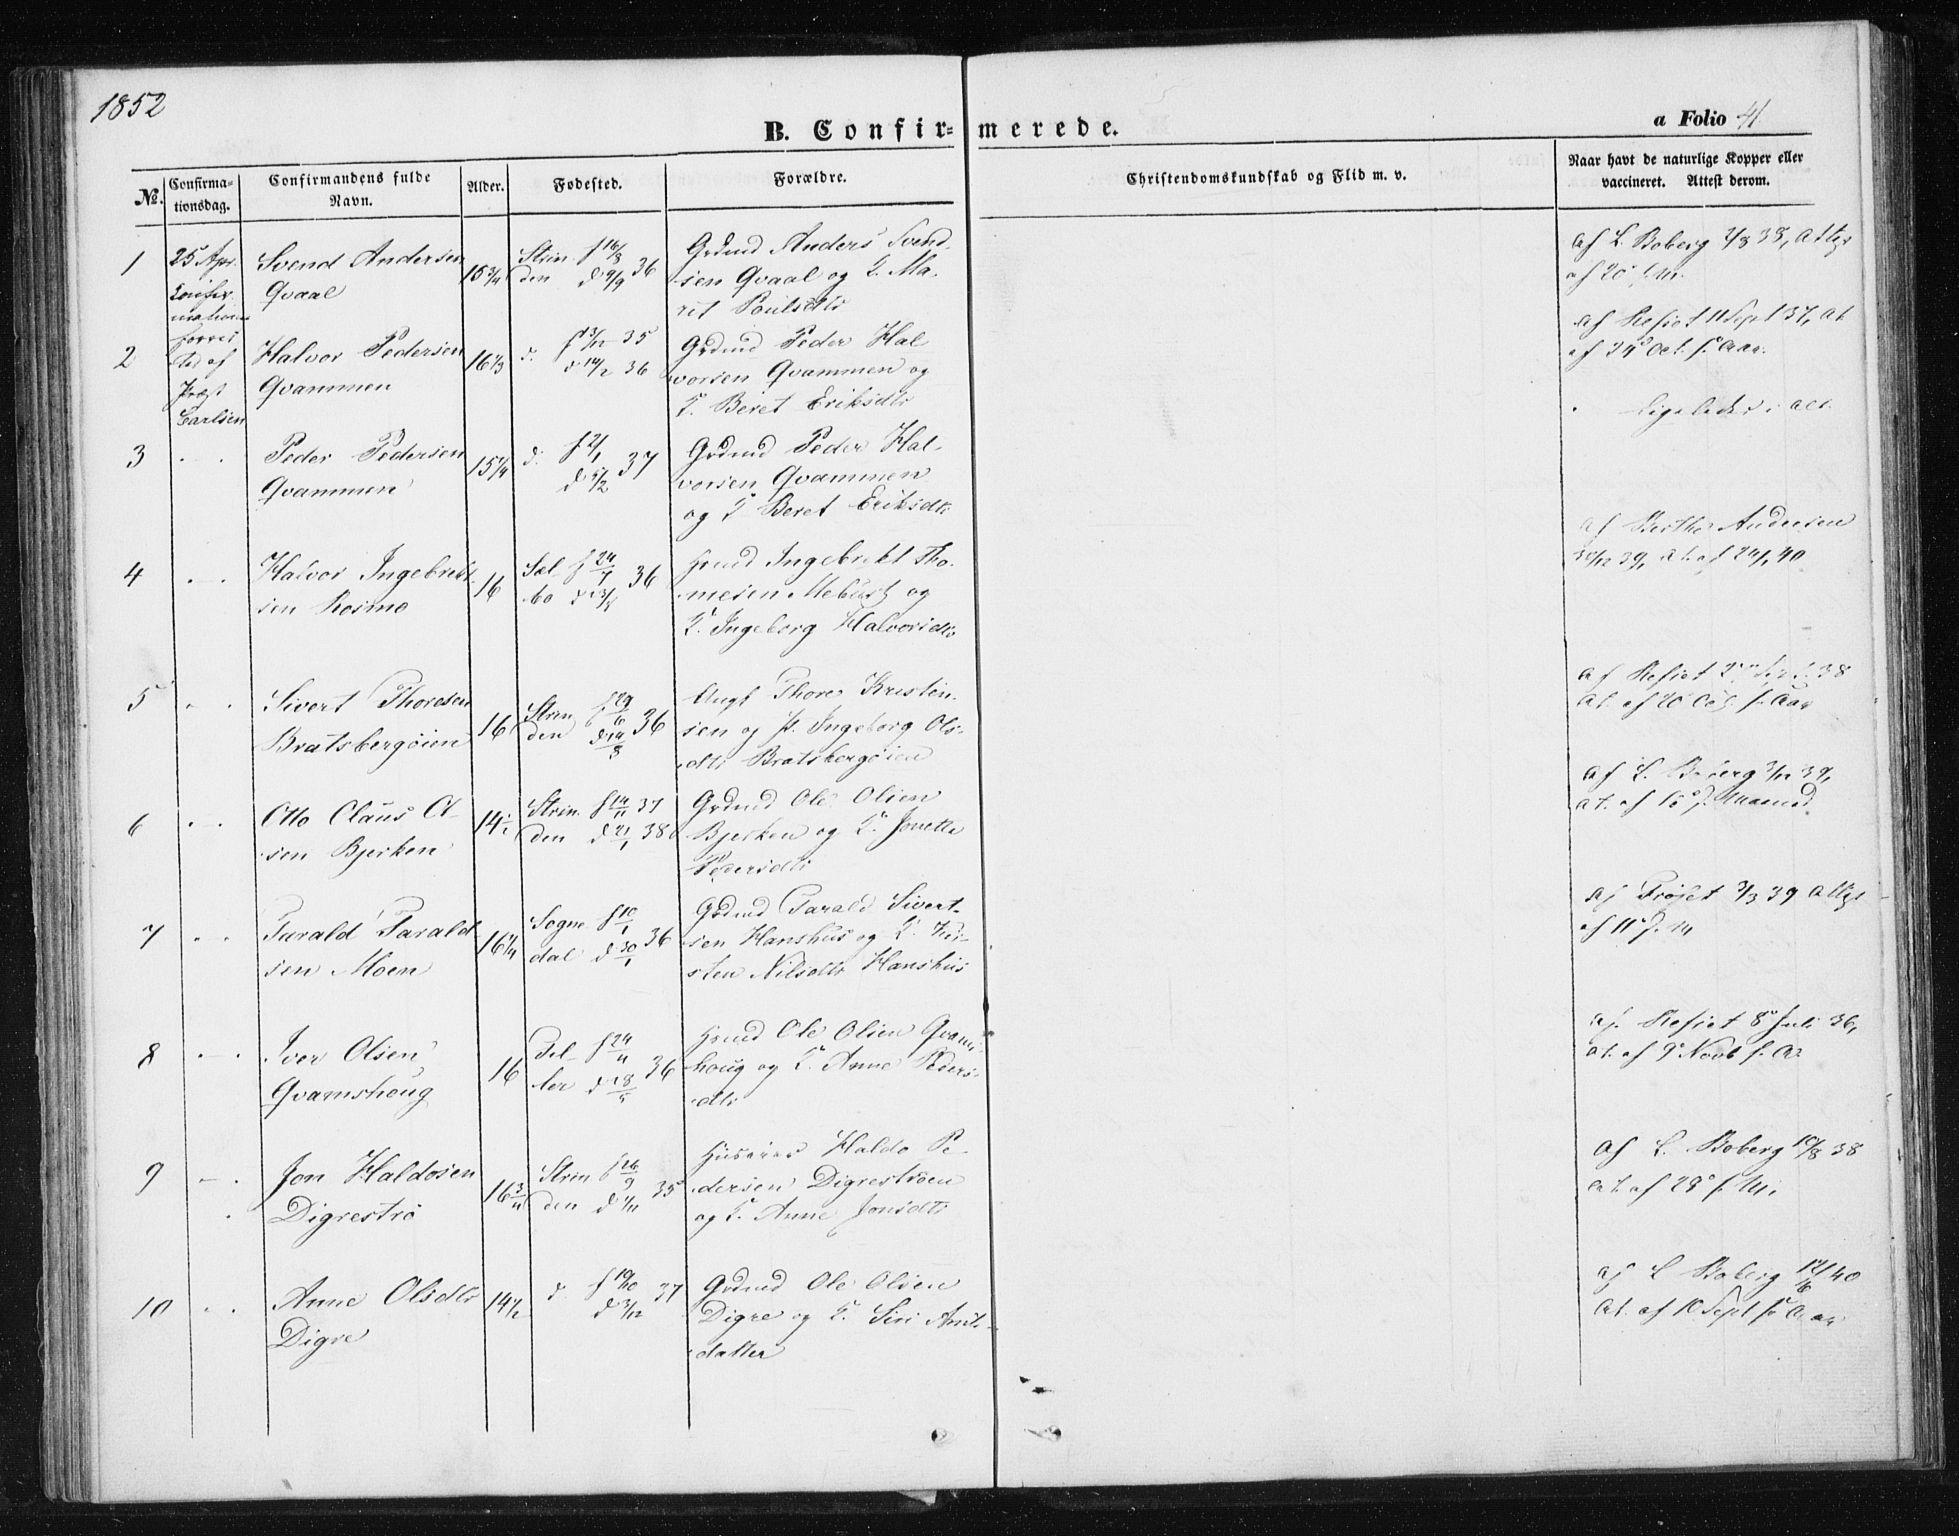 SAT, Ministerialprotokoller, klokkerbøker og fødselsregistre - Sør-Trøndelag, 608/L0332: Parish register (official) no. 608A01, 1848-1861, p. 41